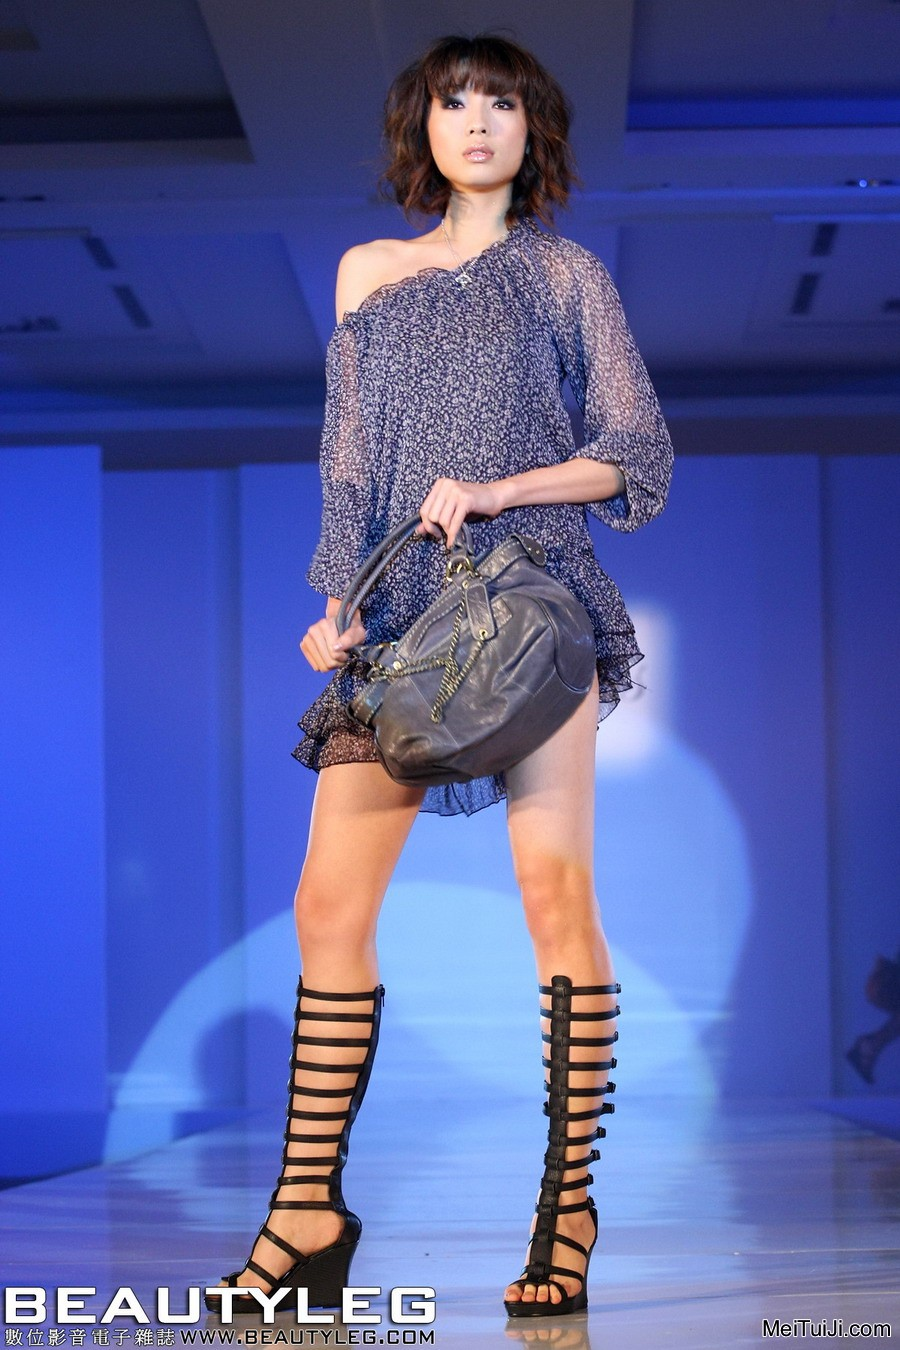 Beauty Update Kylie Jenner Lipkit Dupes: 20080408 BEAUTY NEWS UPDATE 03_丝袜美腿-美腿集-Beautyleg